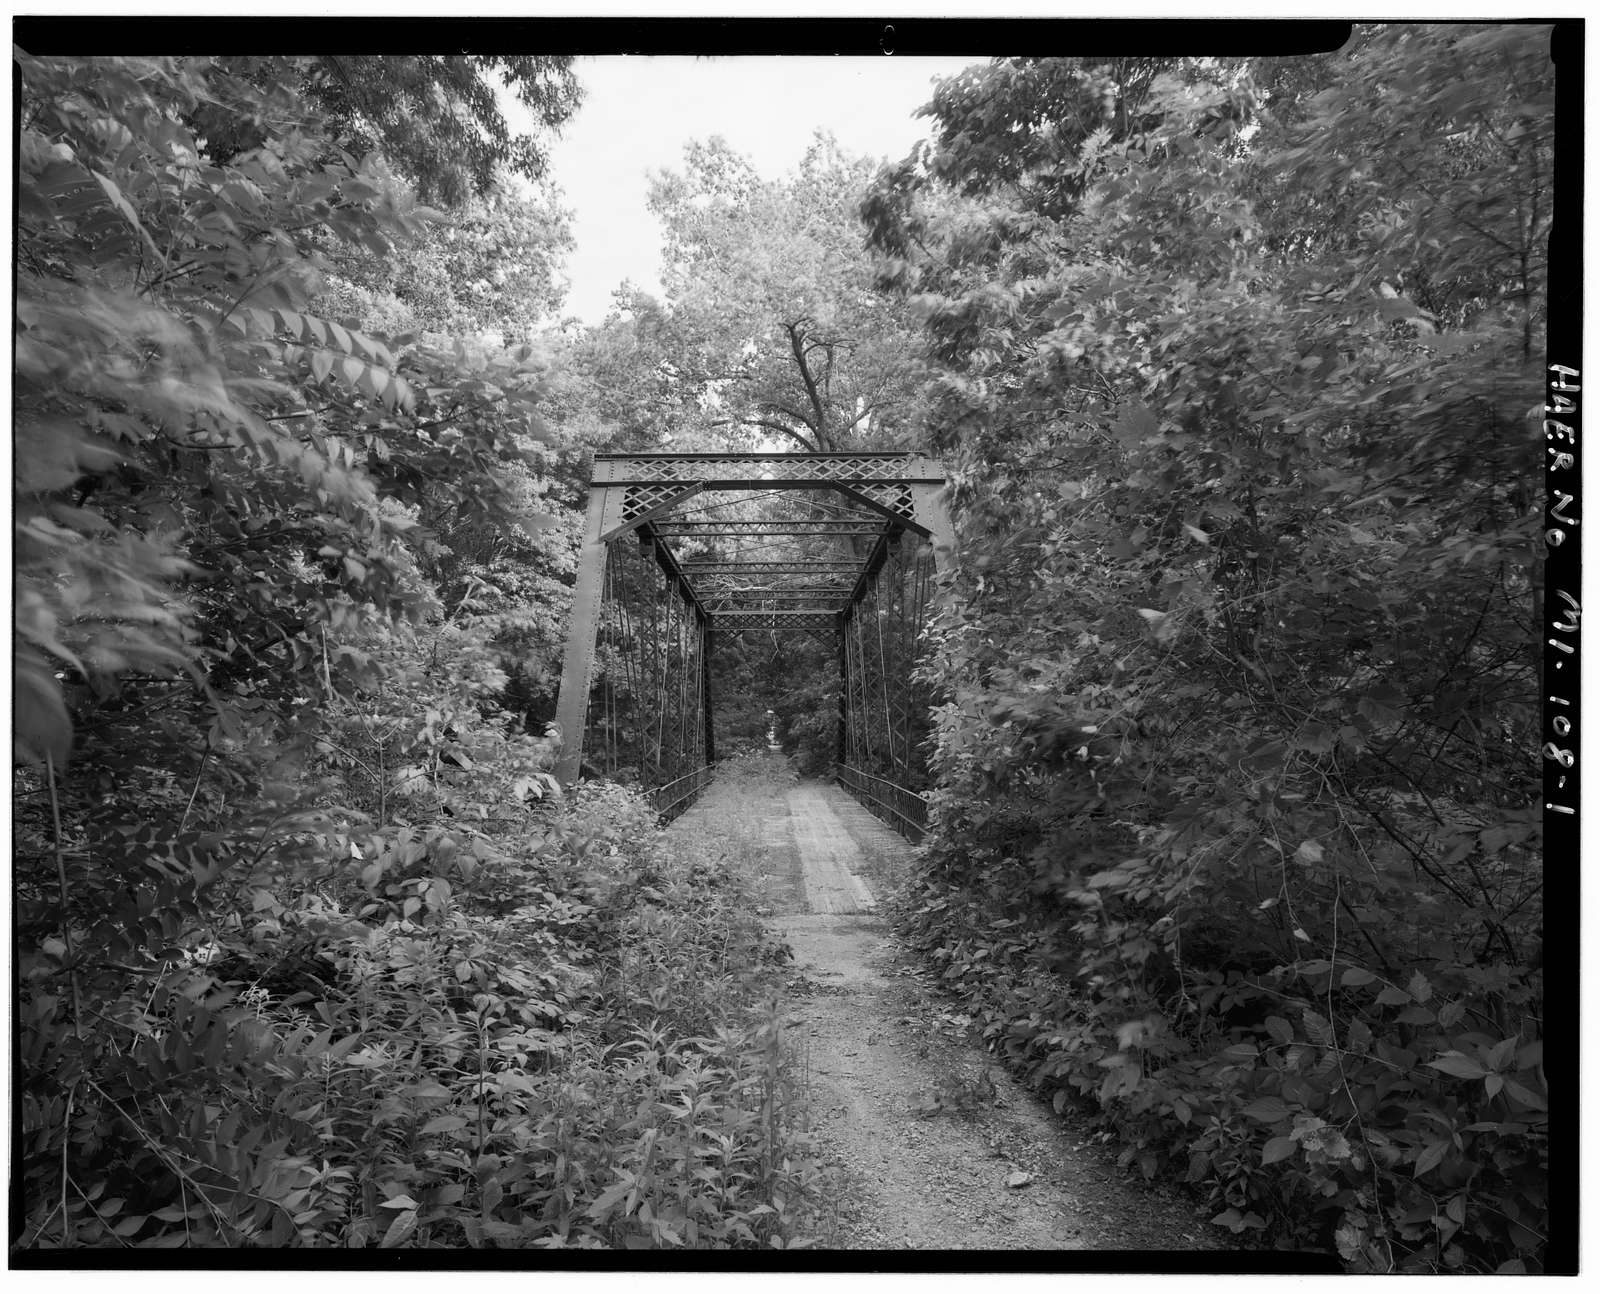 Scott Highway Bridge, Spanning Black Creek, Blissfield, Lenawee County, MI